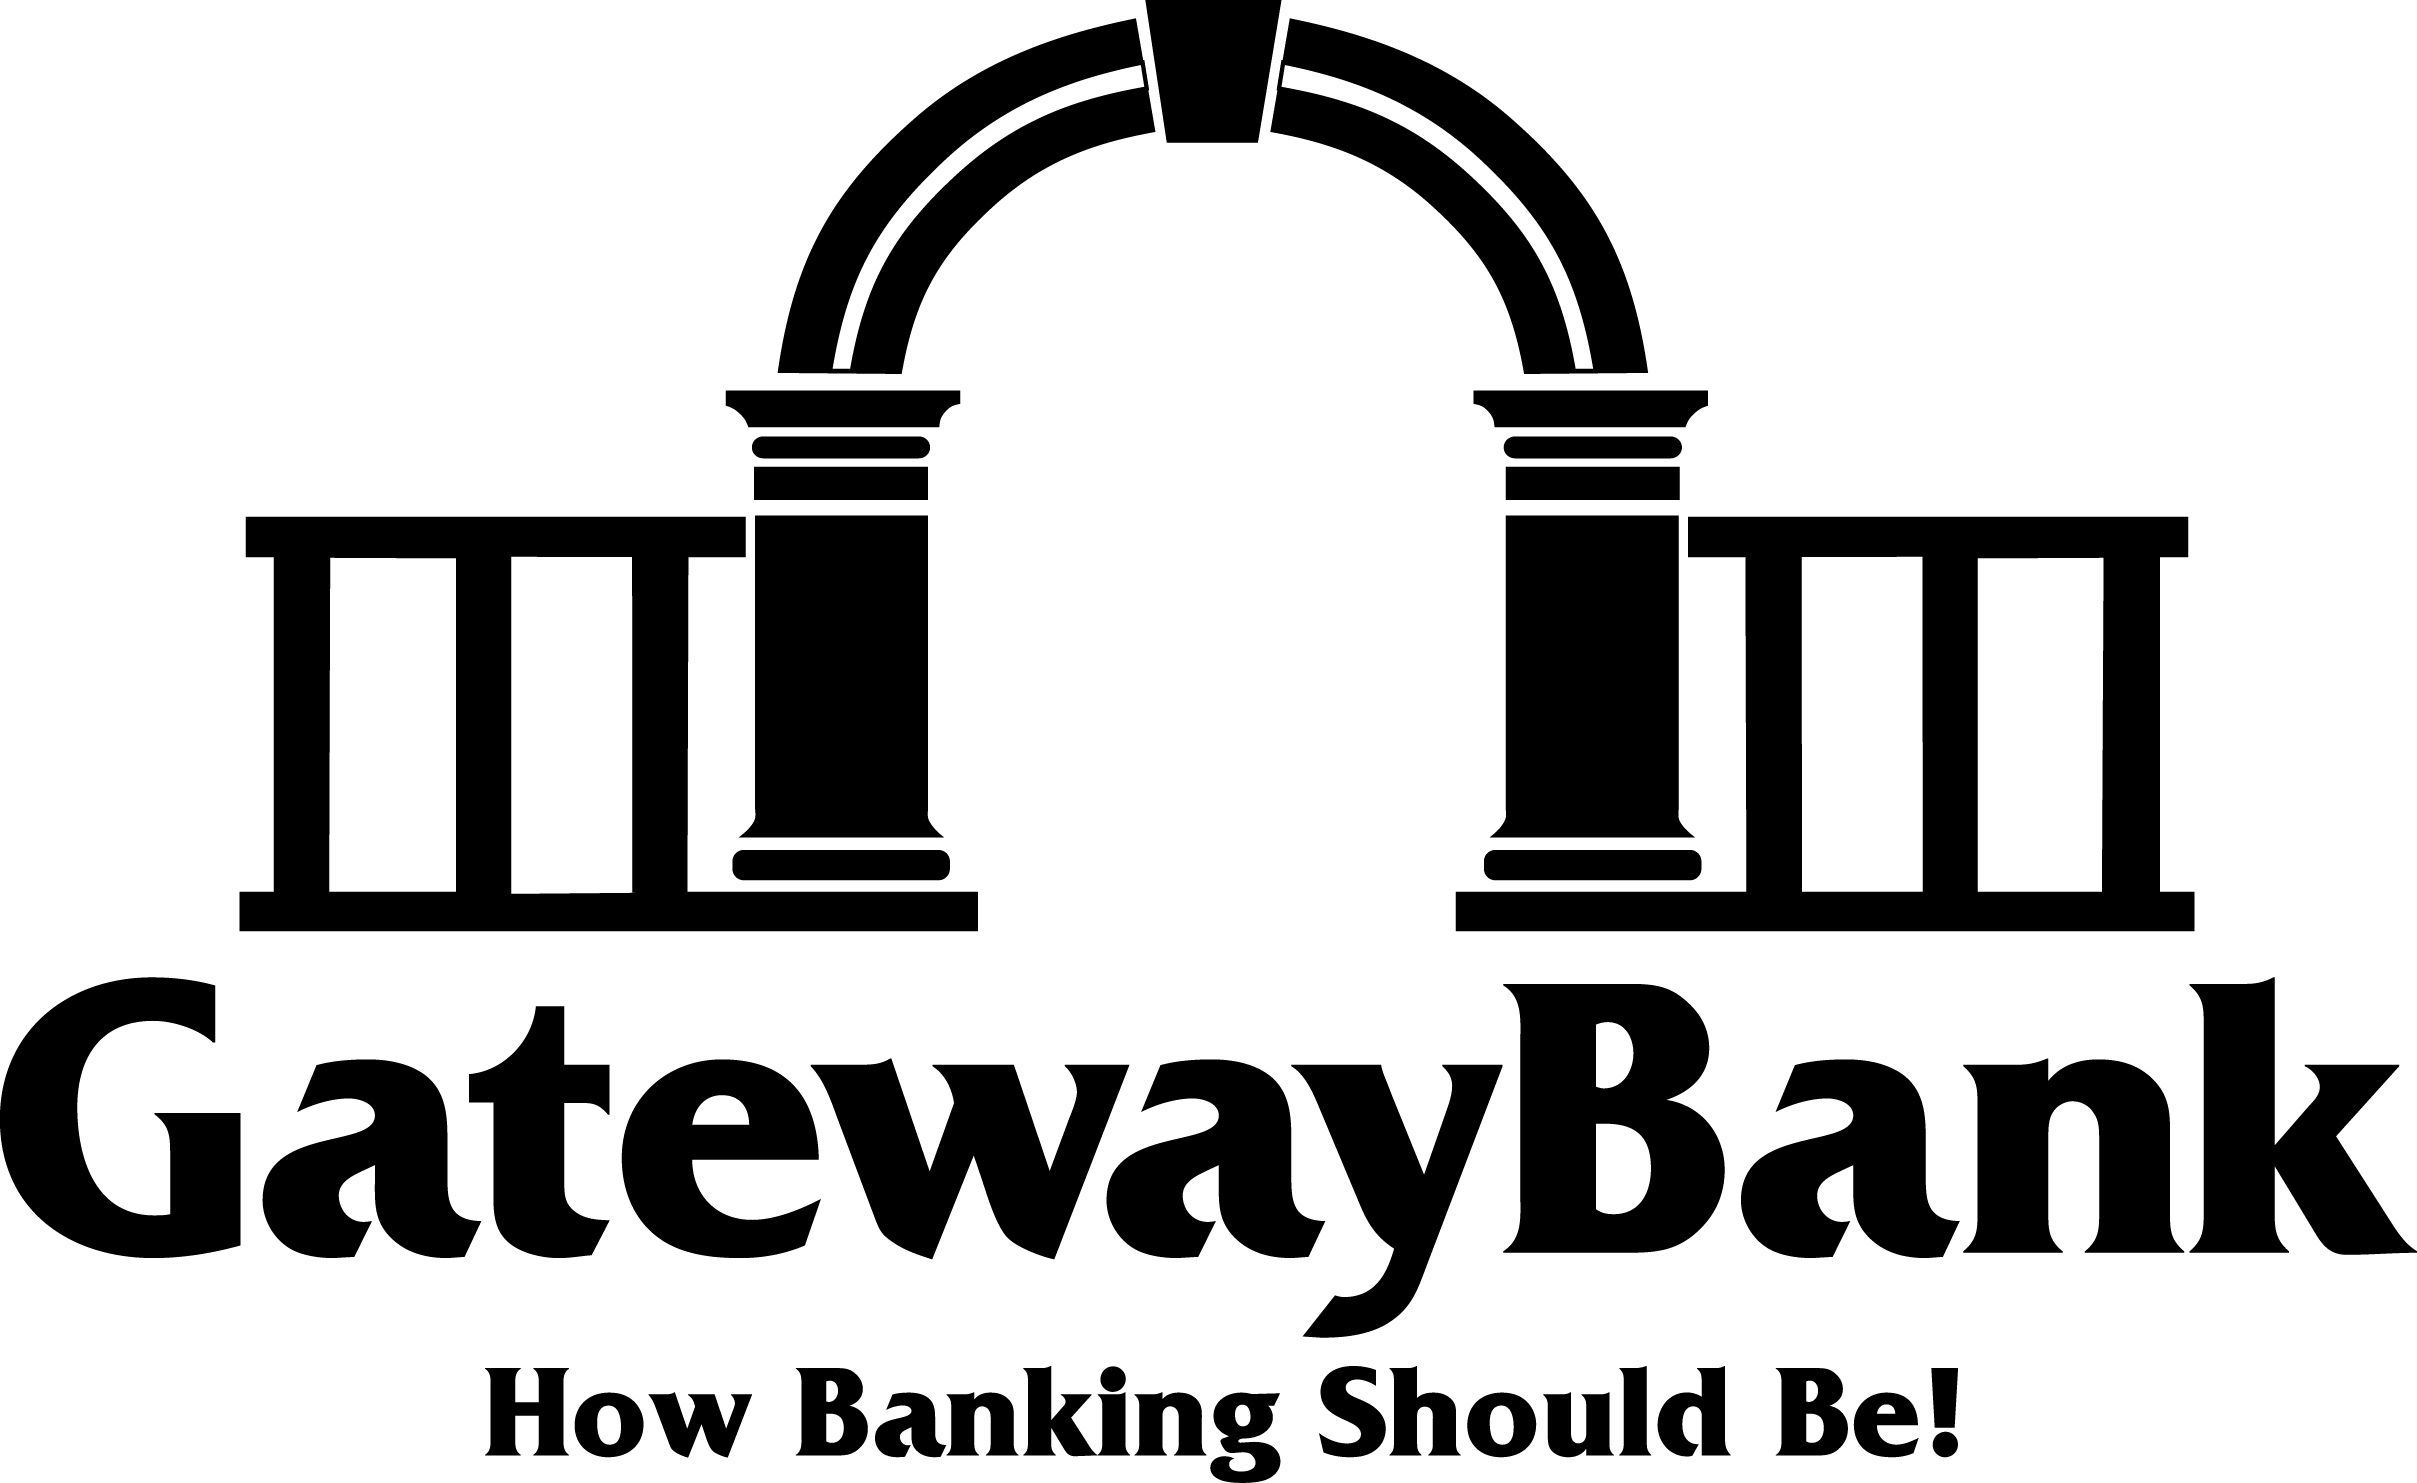 Gateway Bank Of Southwest Florida Employees Volunteer Over